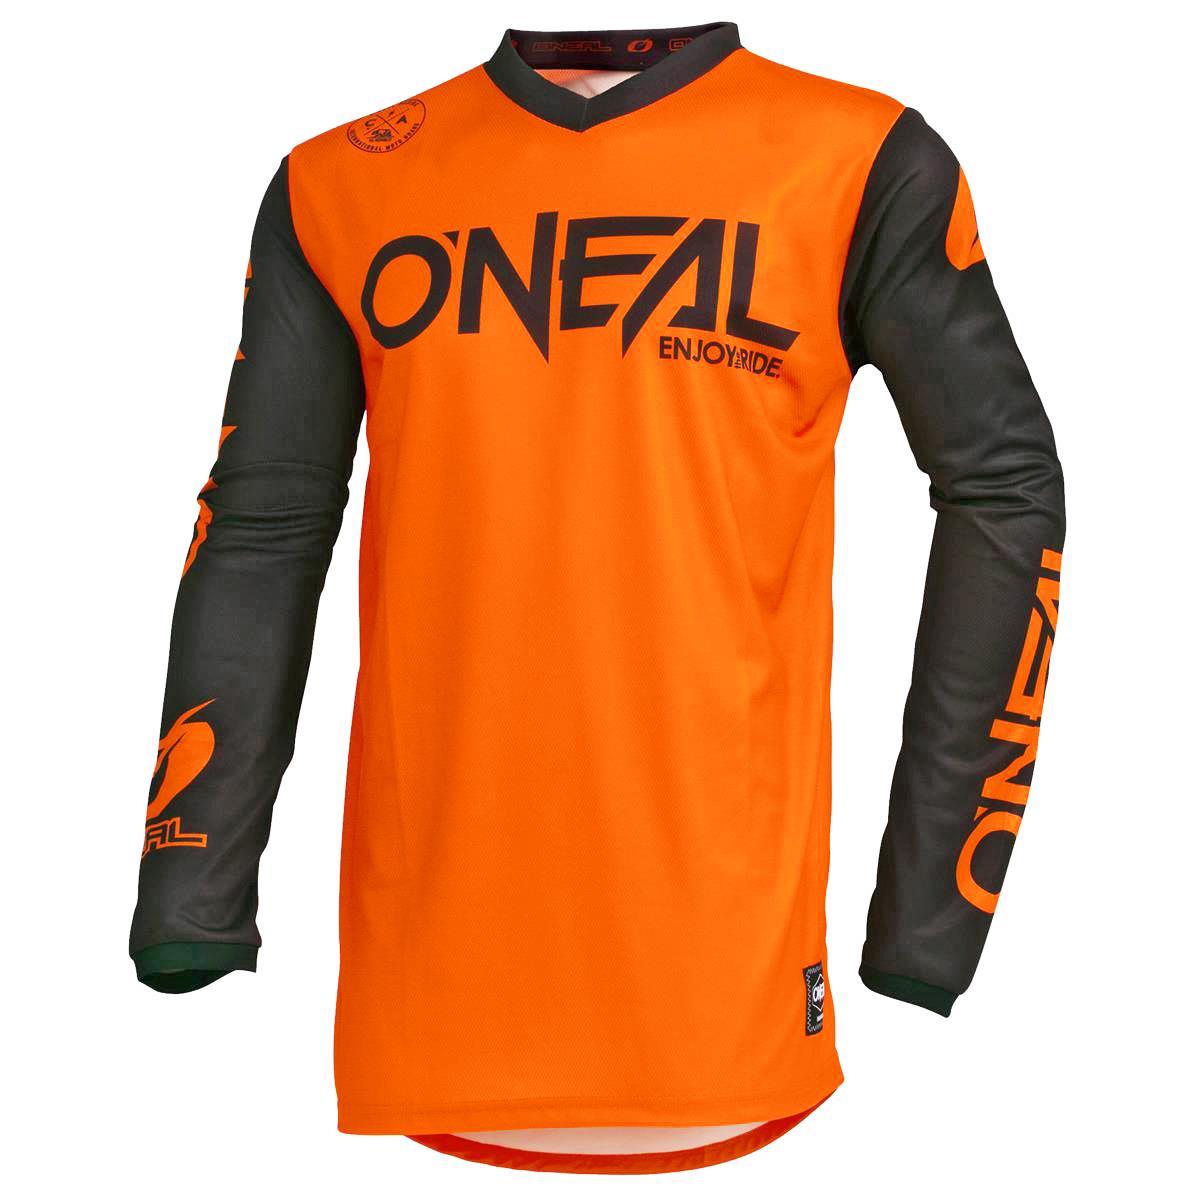 O'Neal Jersey Threat Rider Orange